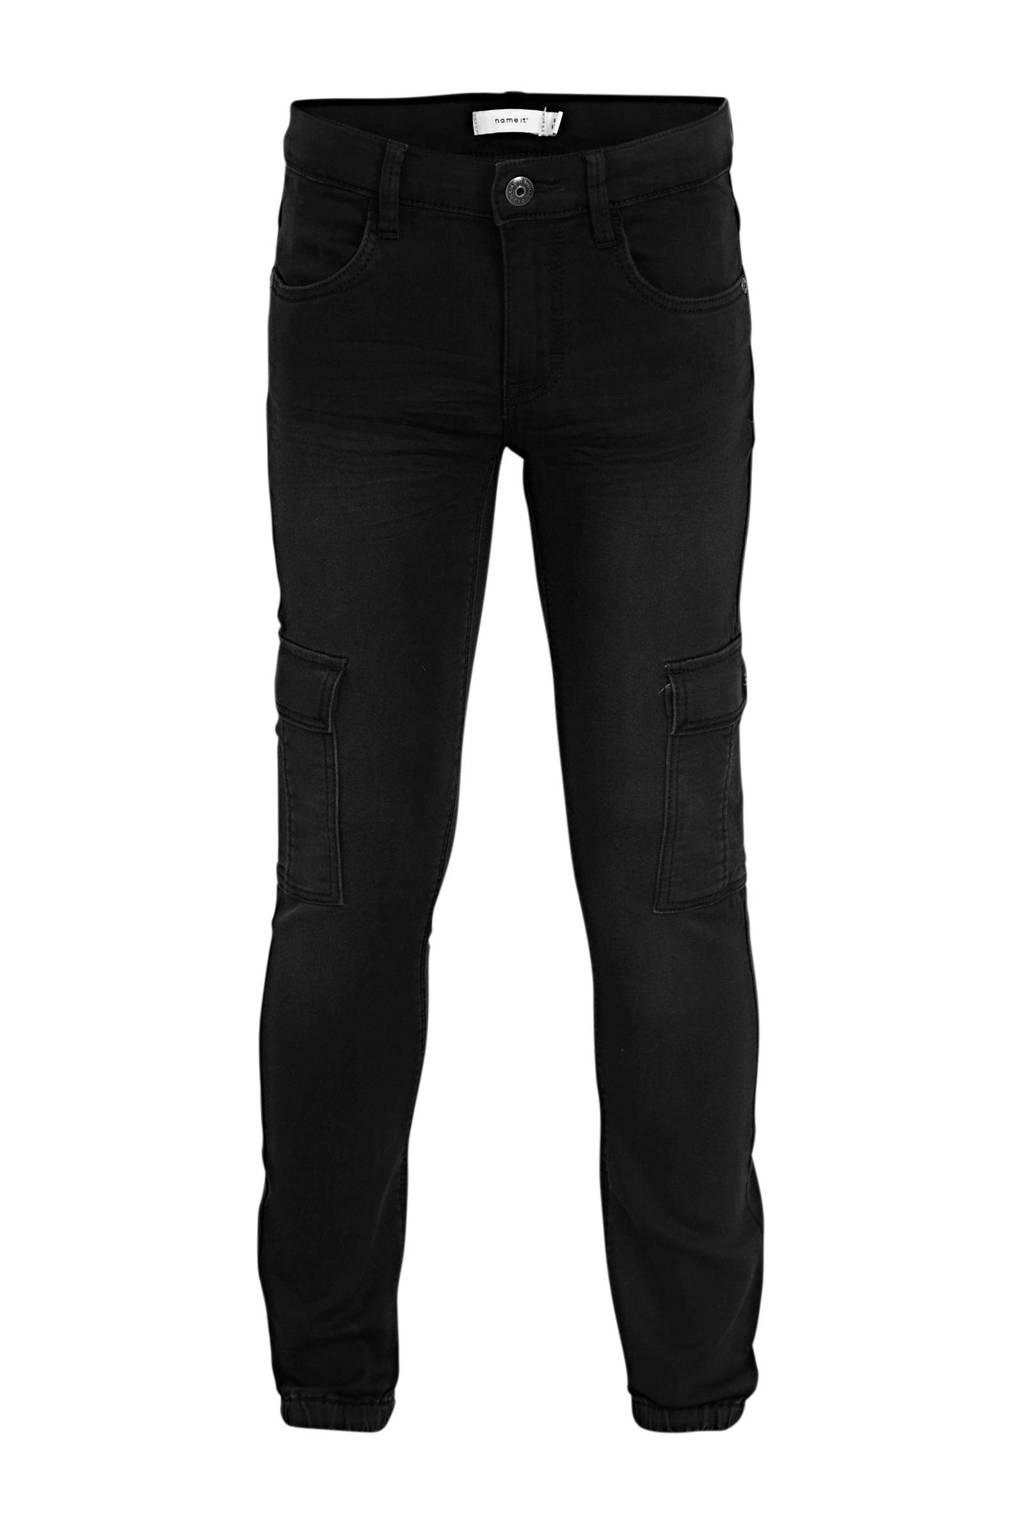 NAME IT KIDS regular fit jeans Romeo met biologisch katoen dark denim, Dark denim